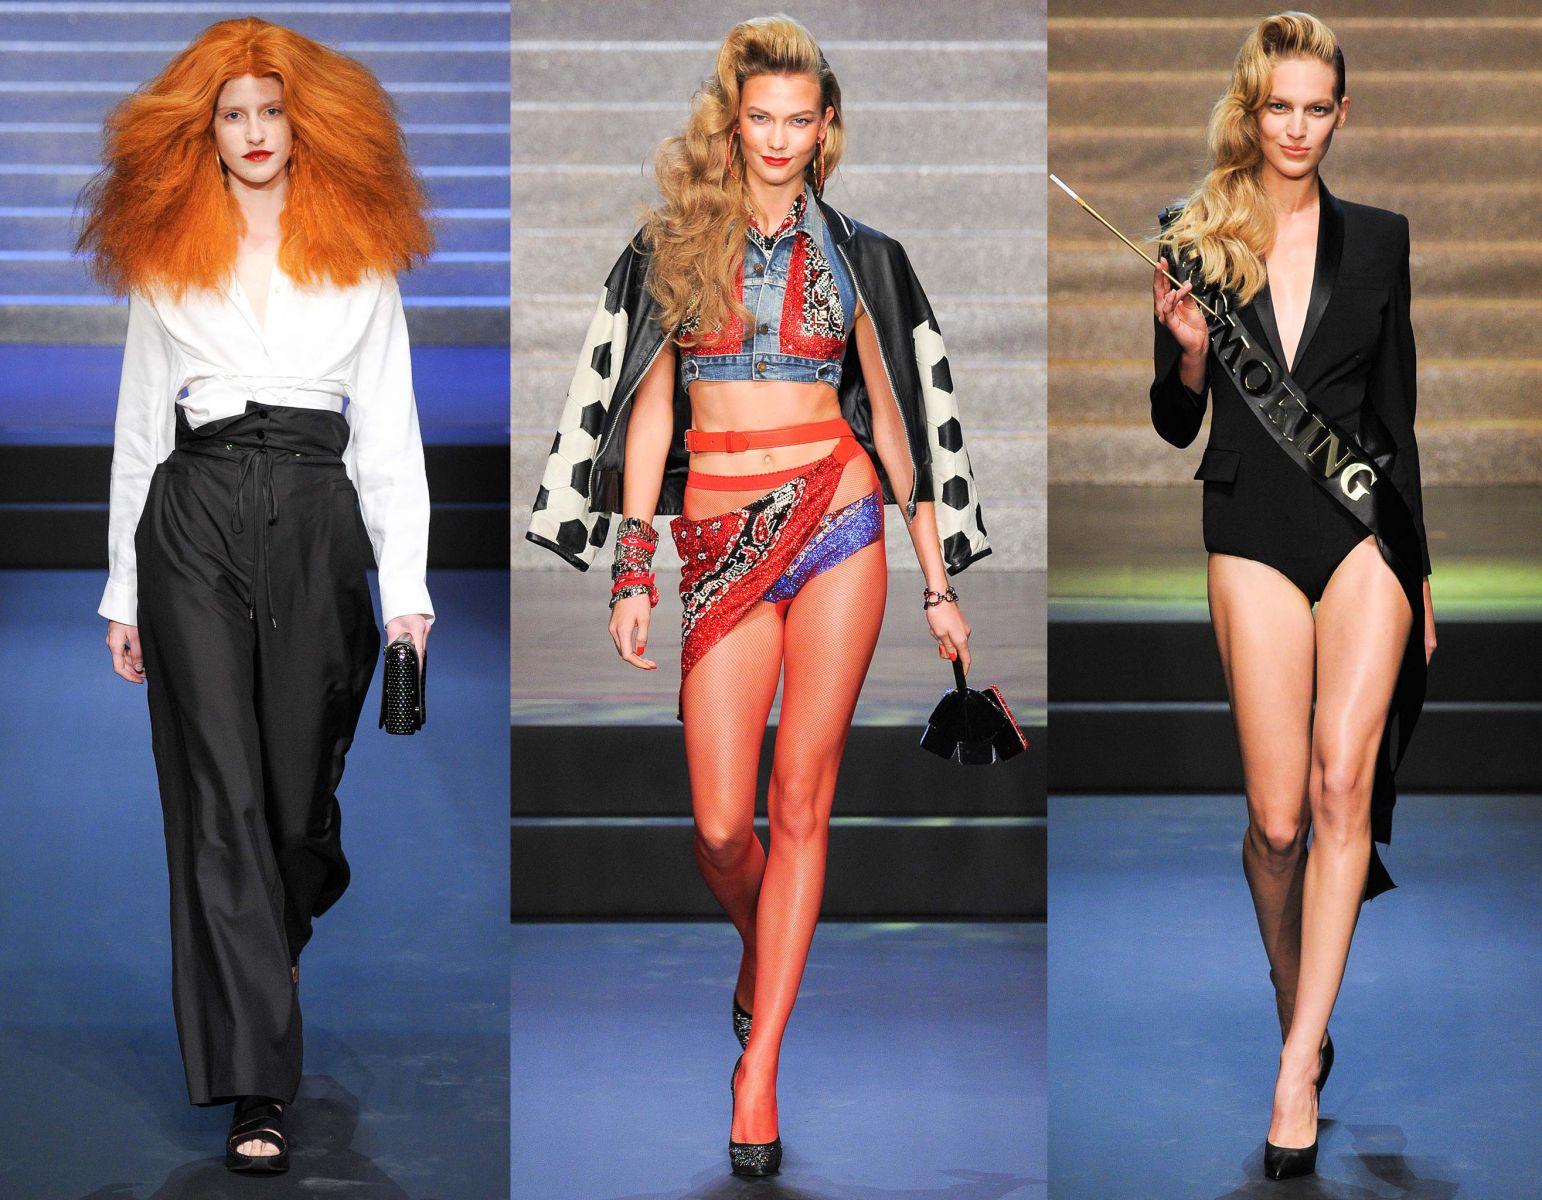 Неделя моды в Париже: Jean Paul Gaultier, весна-лето 2015 - фото №2